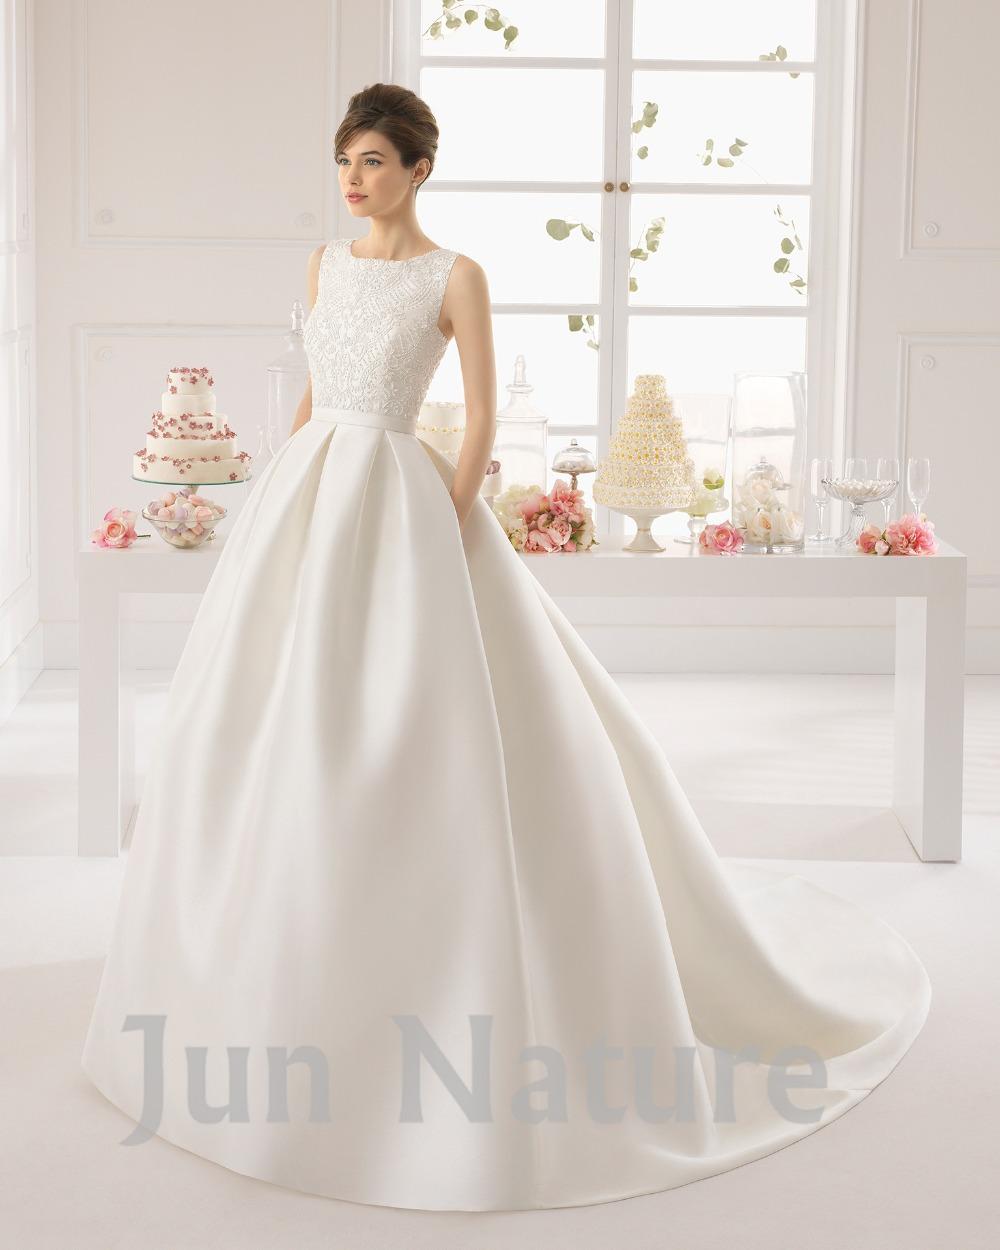 2015 new fashion elegant satin court train ball gown for Elegant satin wedding dresses